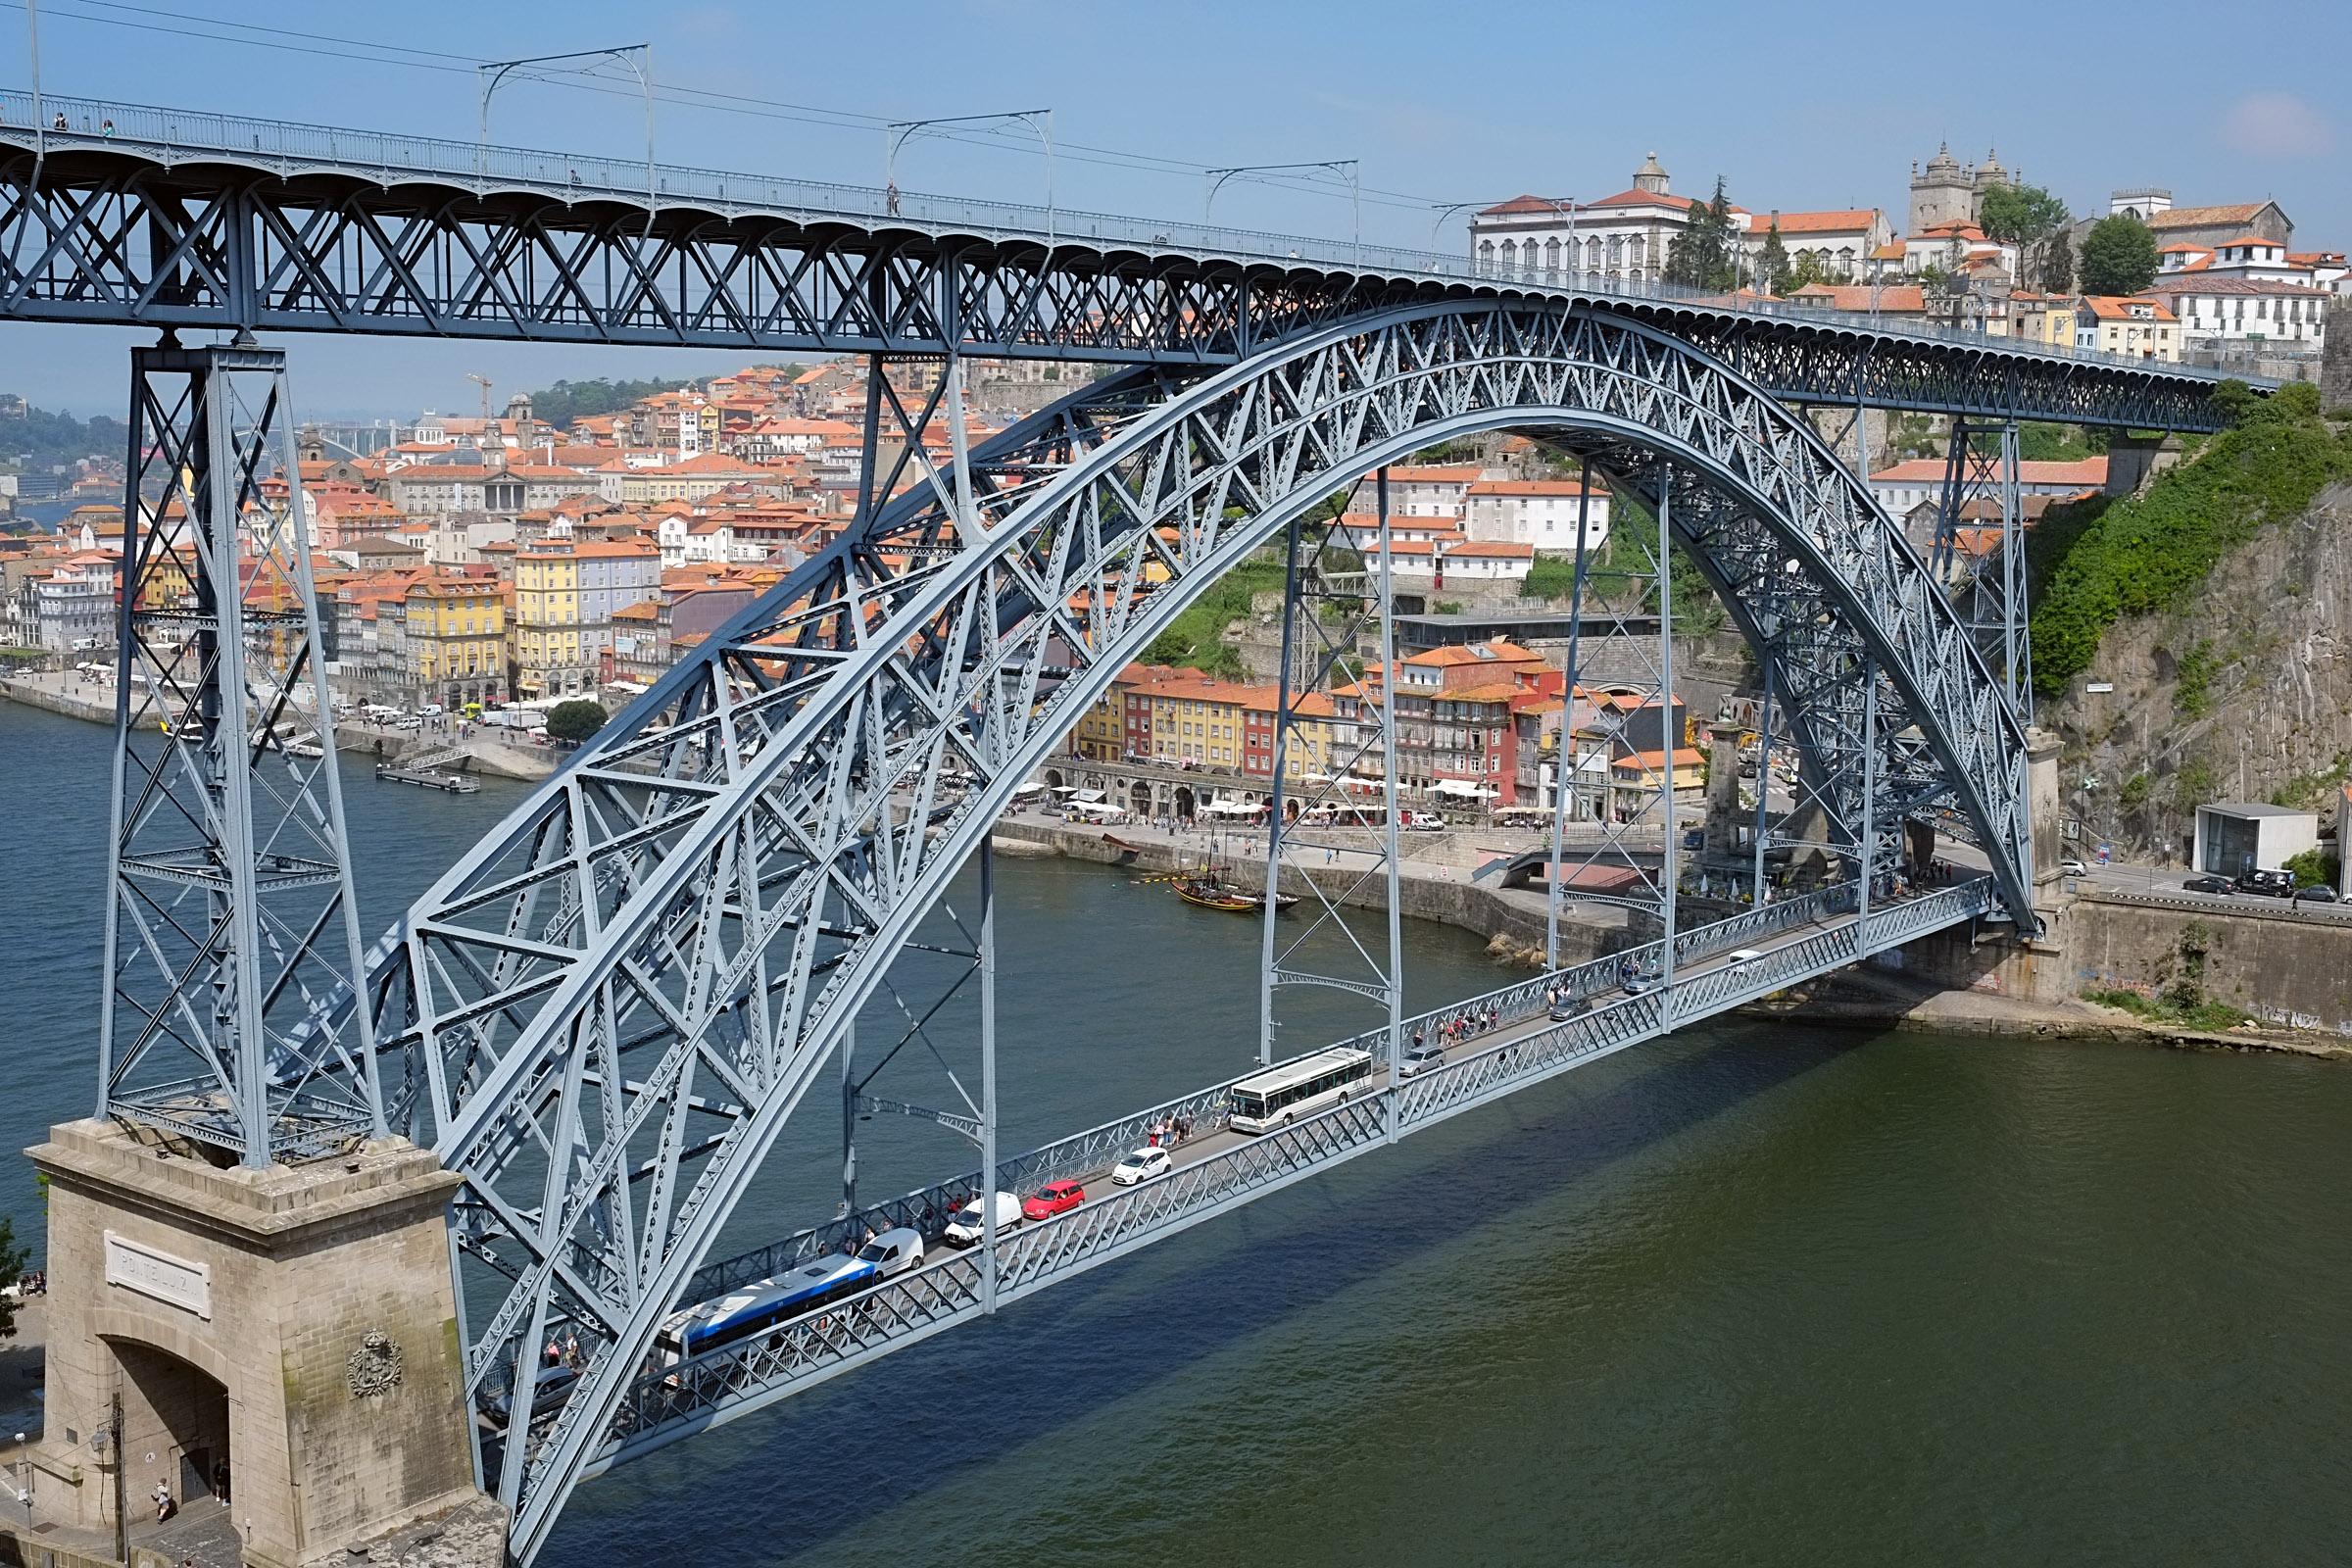 Portugal: Porto Pt. II